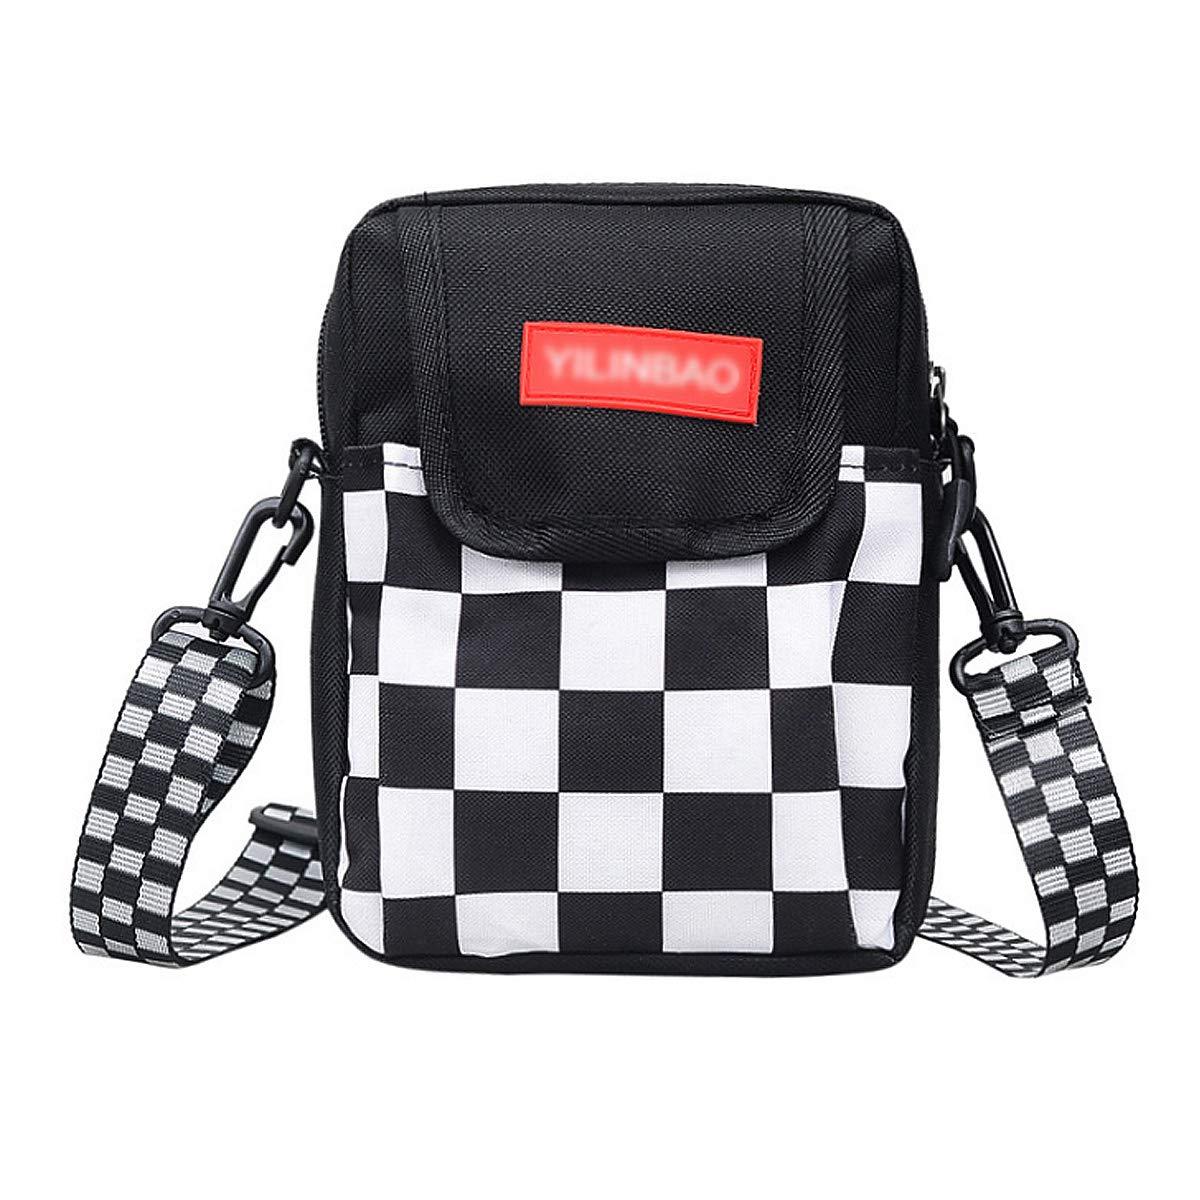 Van Caro Nylon Crossbody bag-Checkerboard Cell Phone Pouch Wallet Purse Shoulder Bag Travel Packs for Unisex